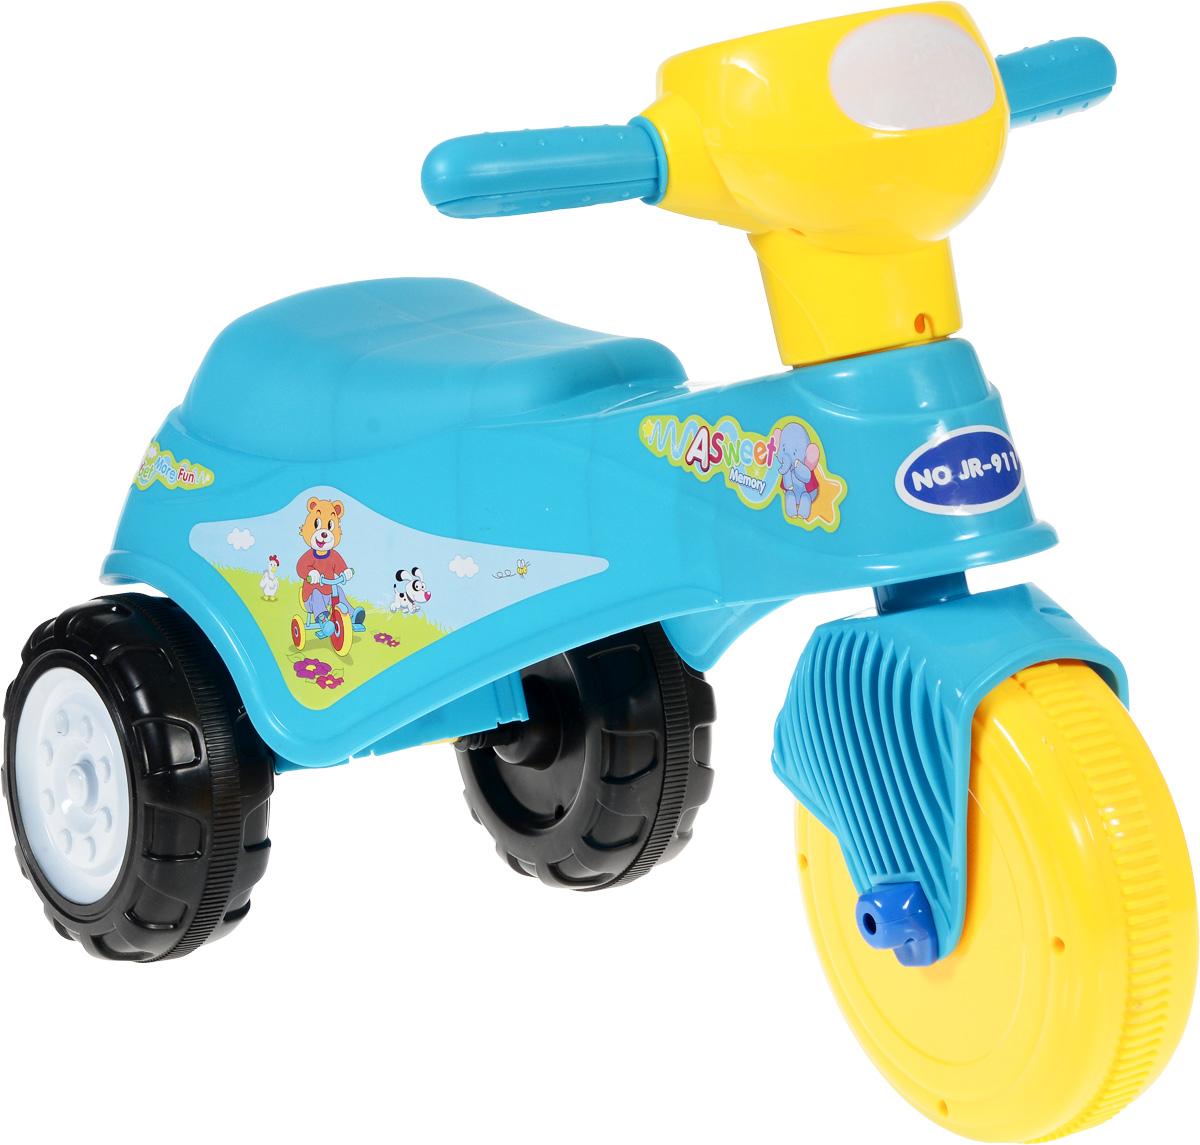 J.R. TOYS Каталка детская Трицикл голубой